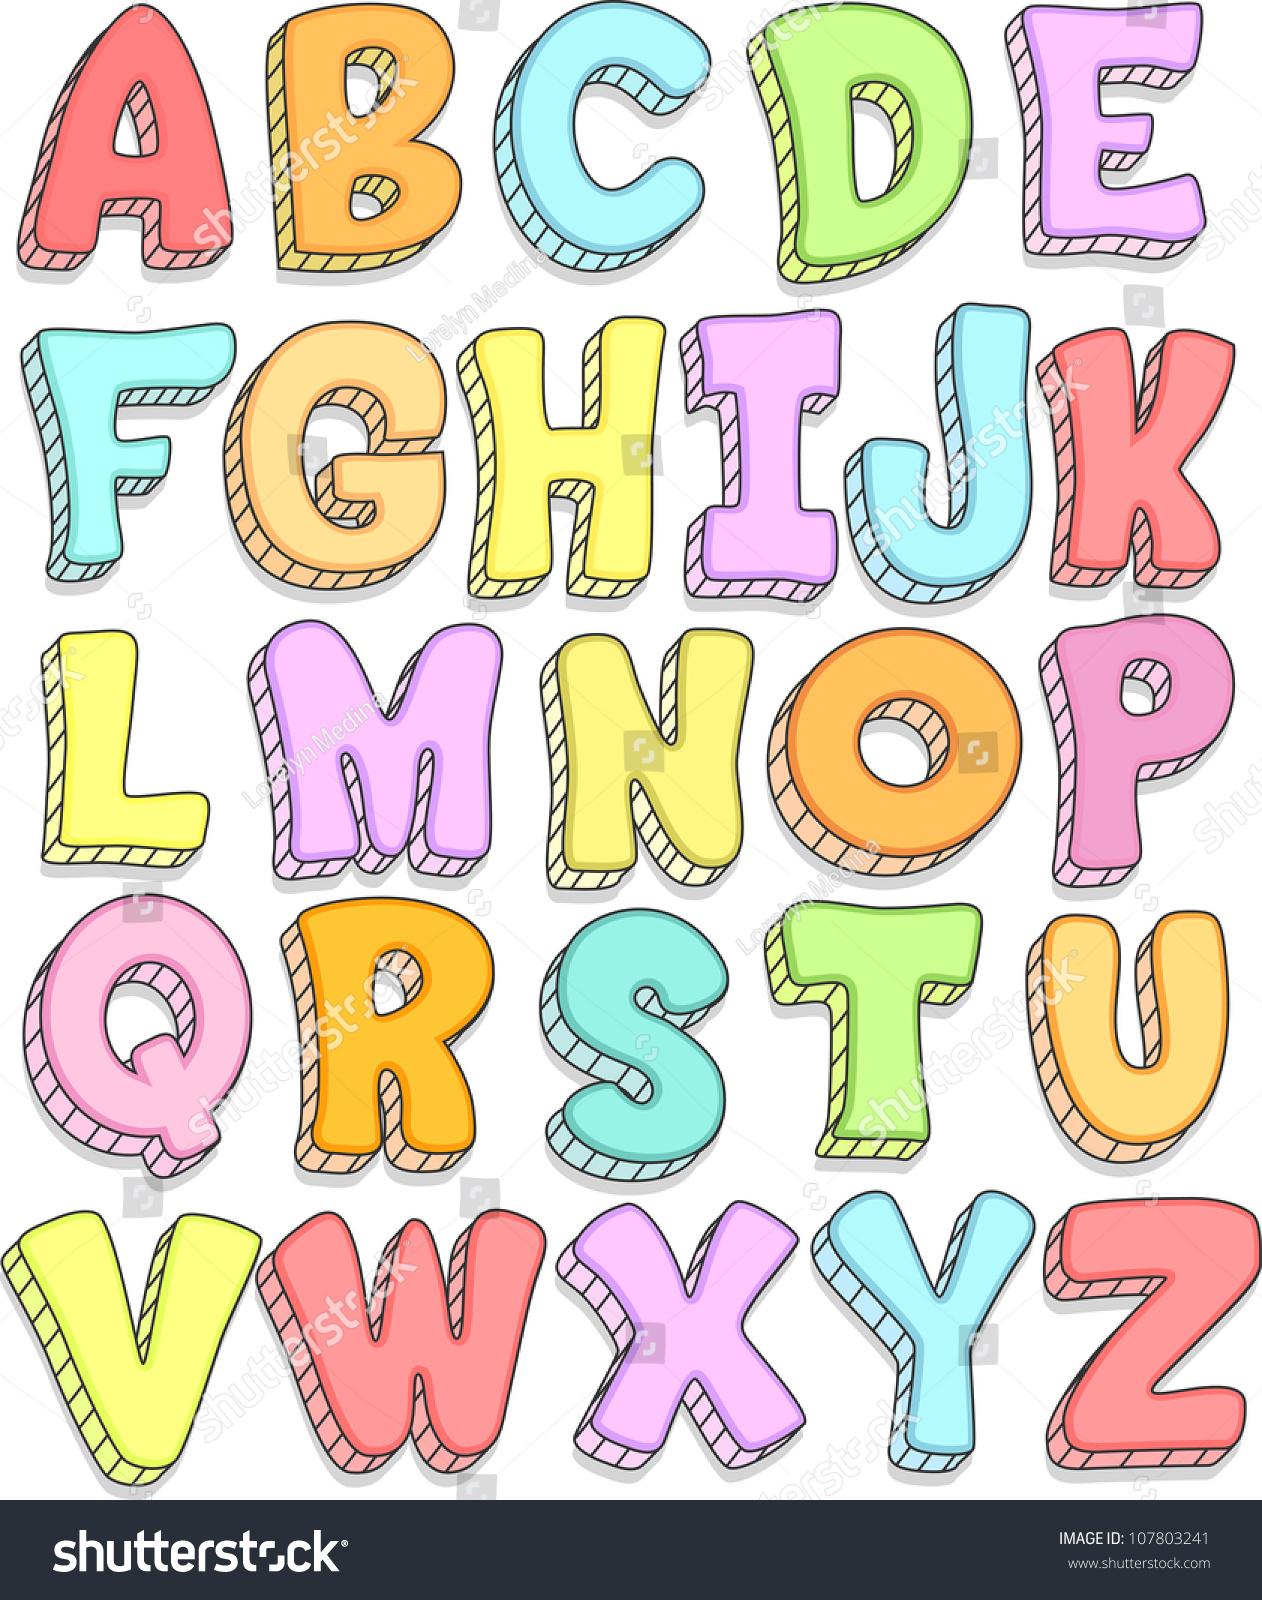 Creative writing alphabets online